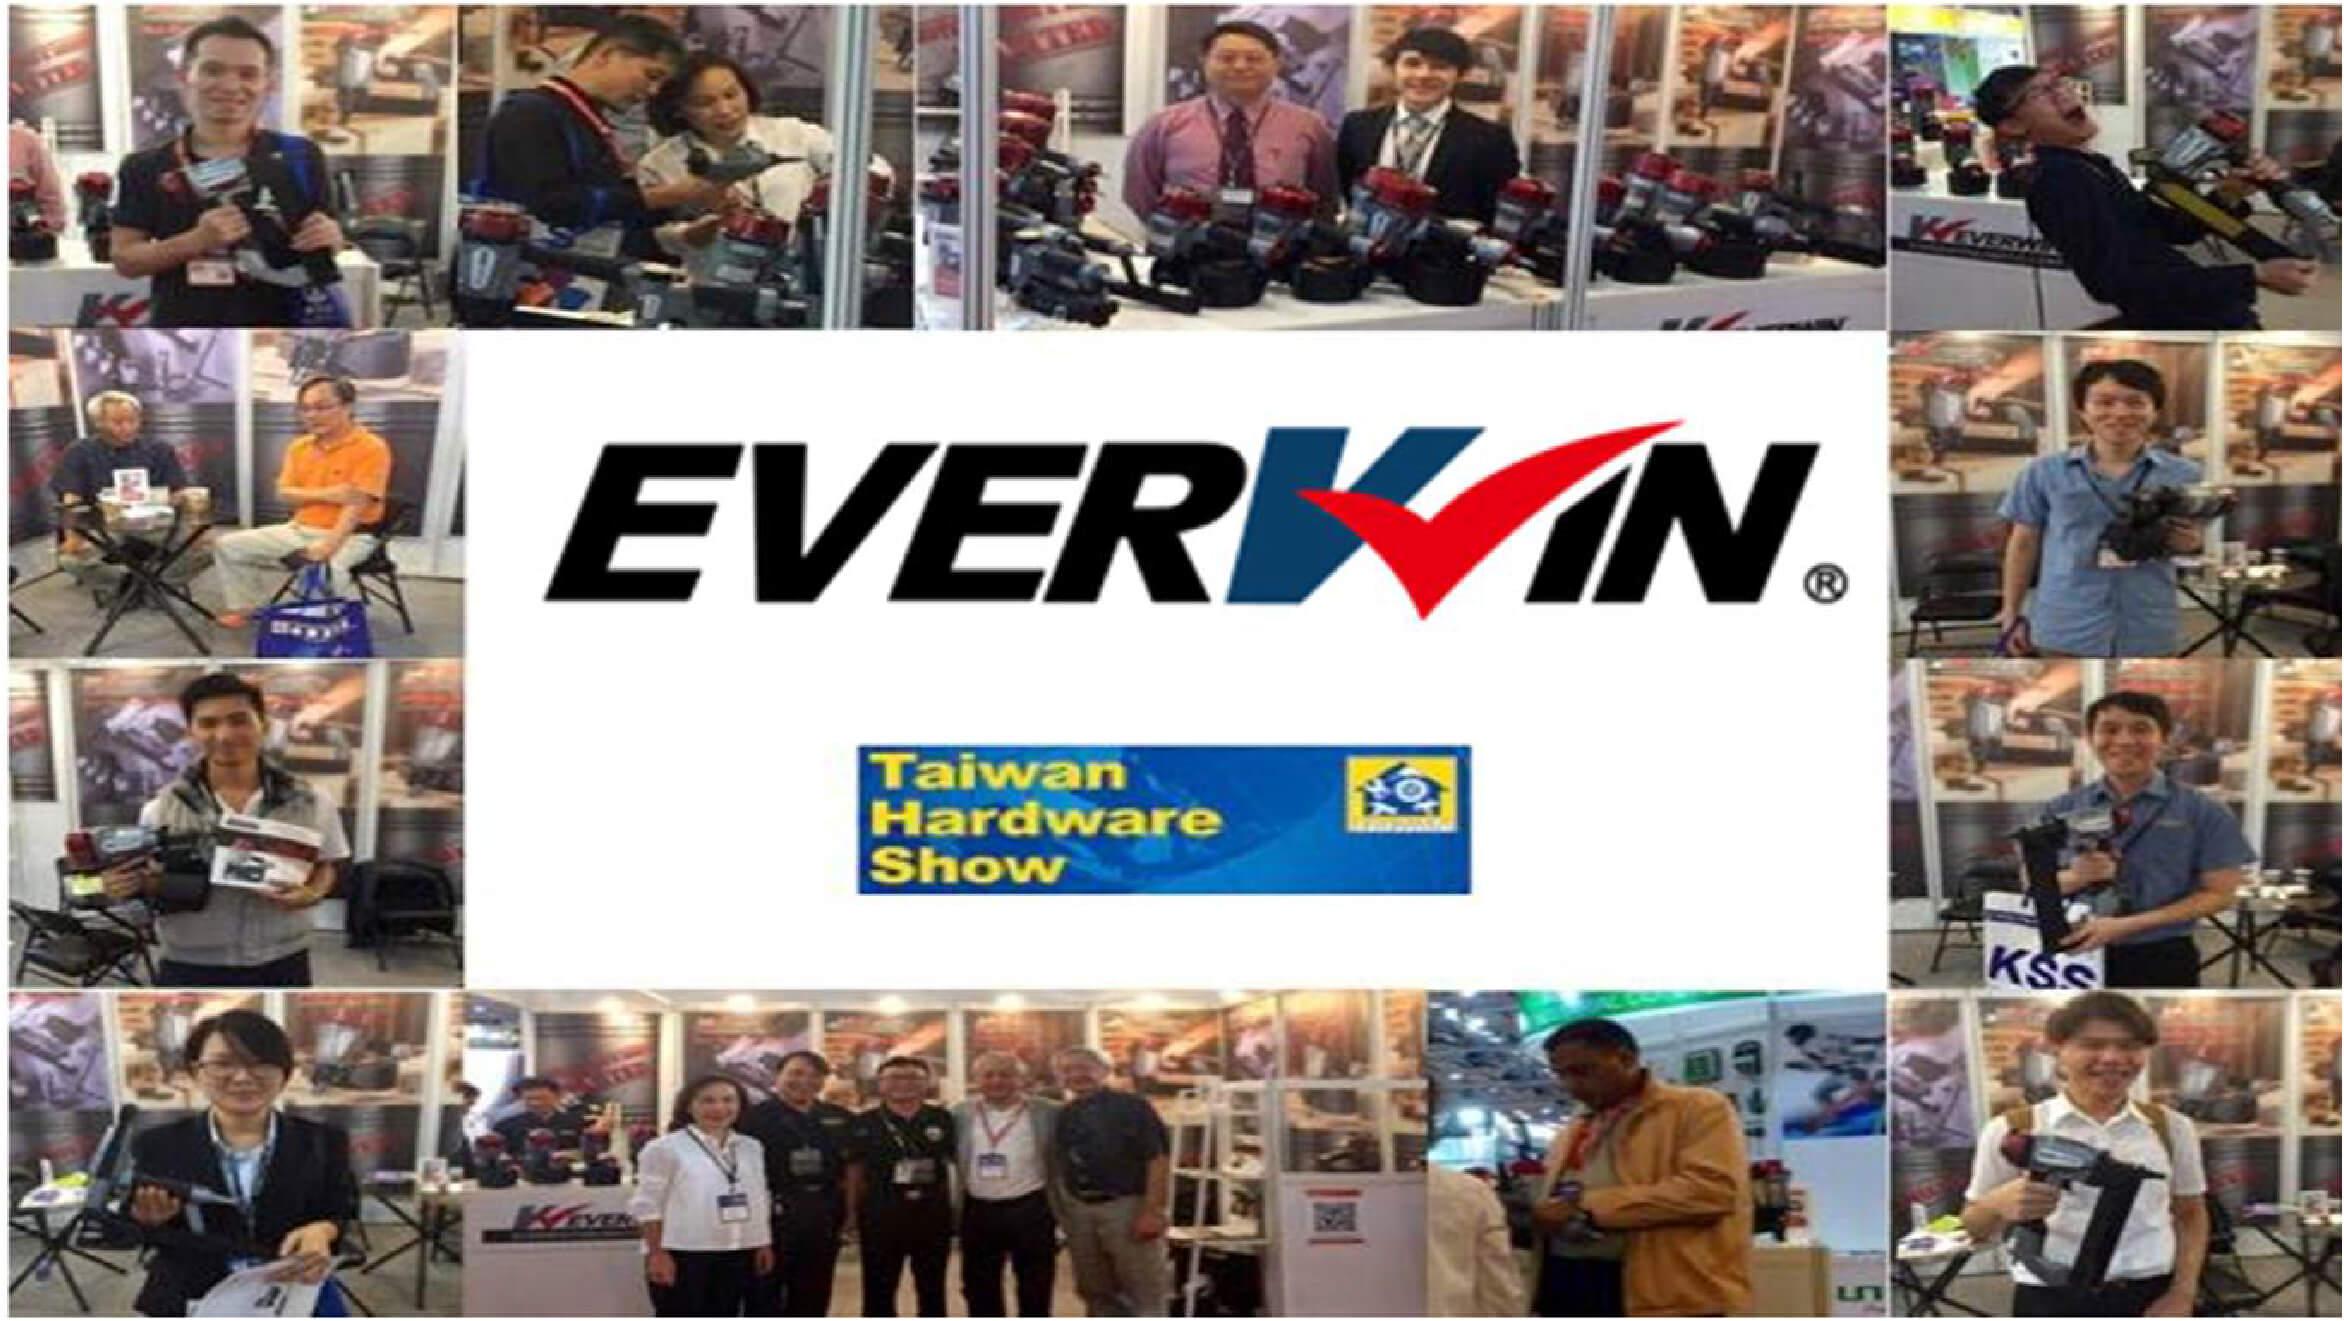 Everwintaiwanhardwareshow.jpg (1.62 MB)